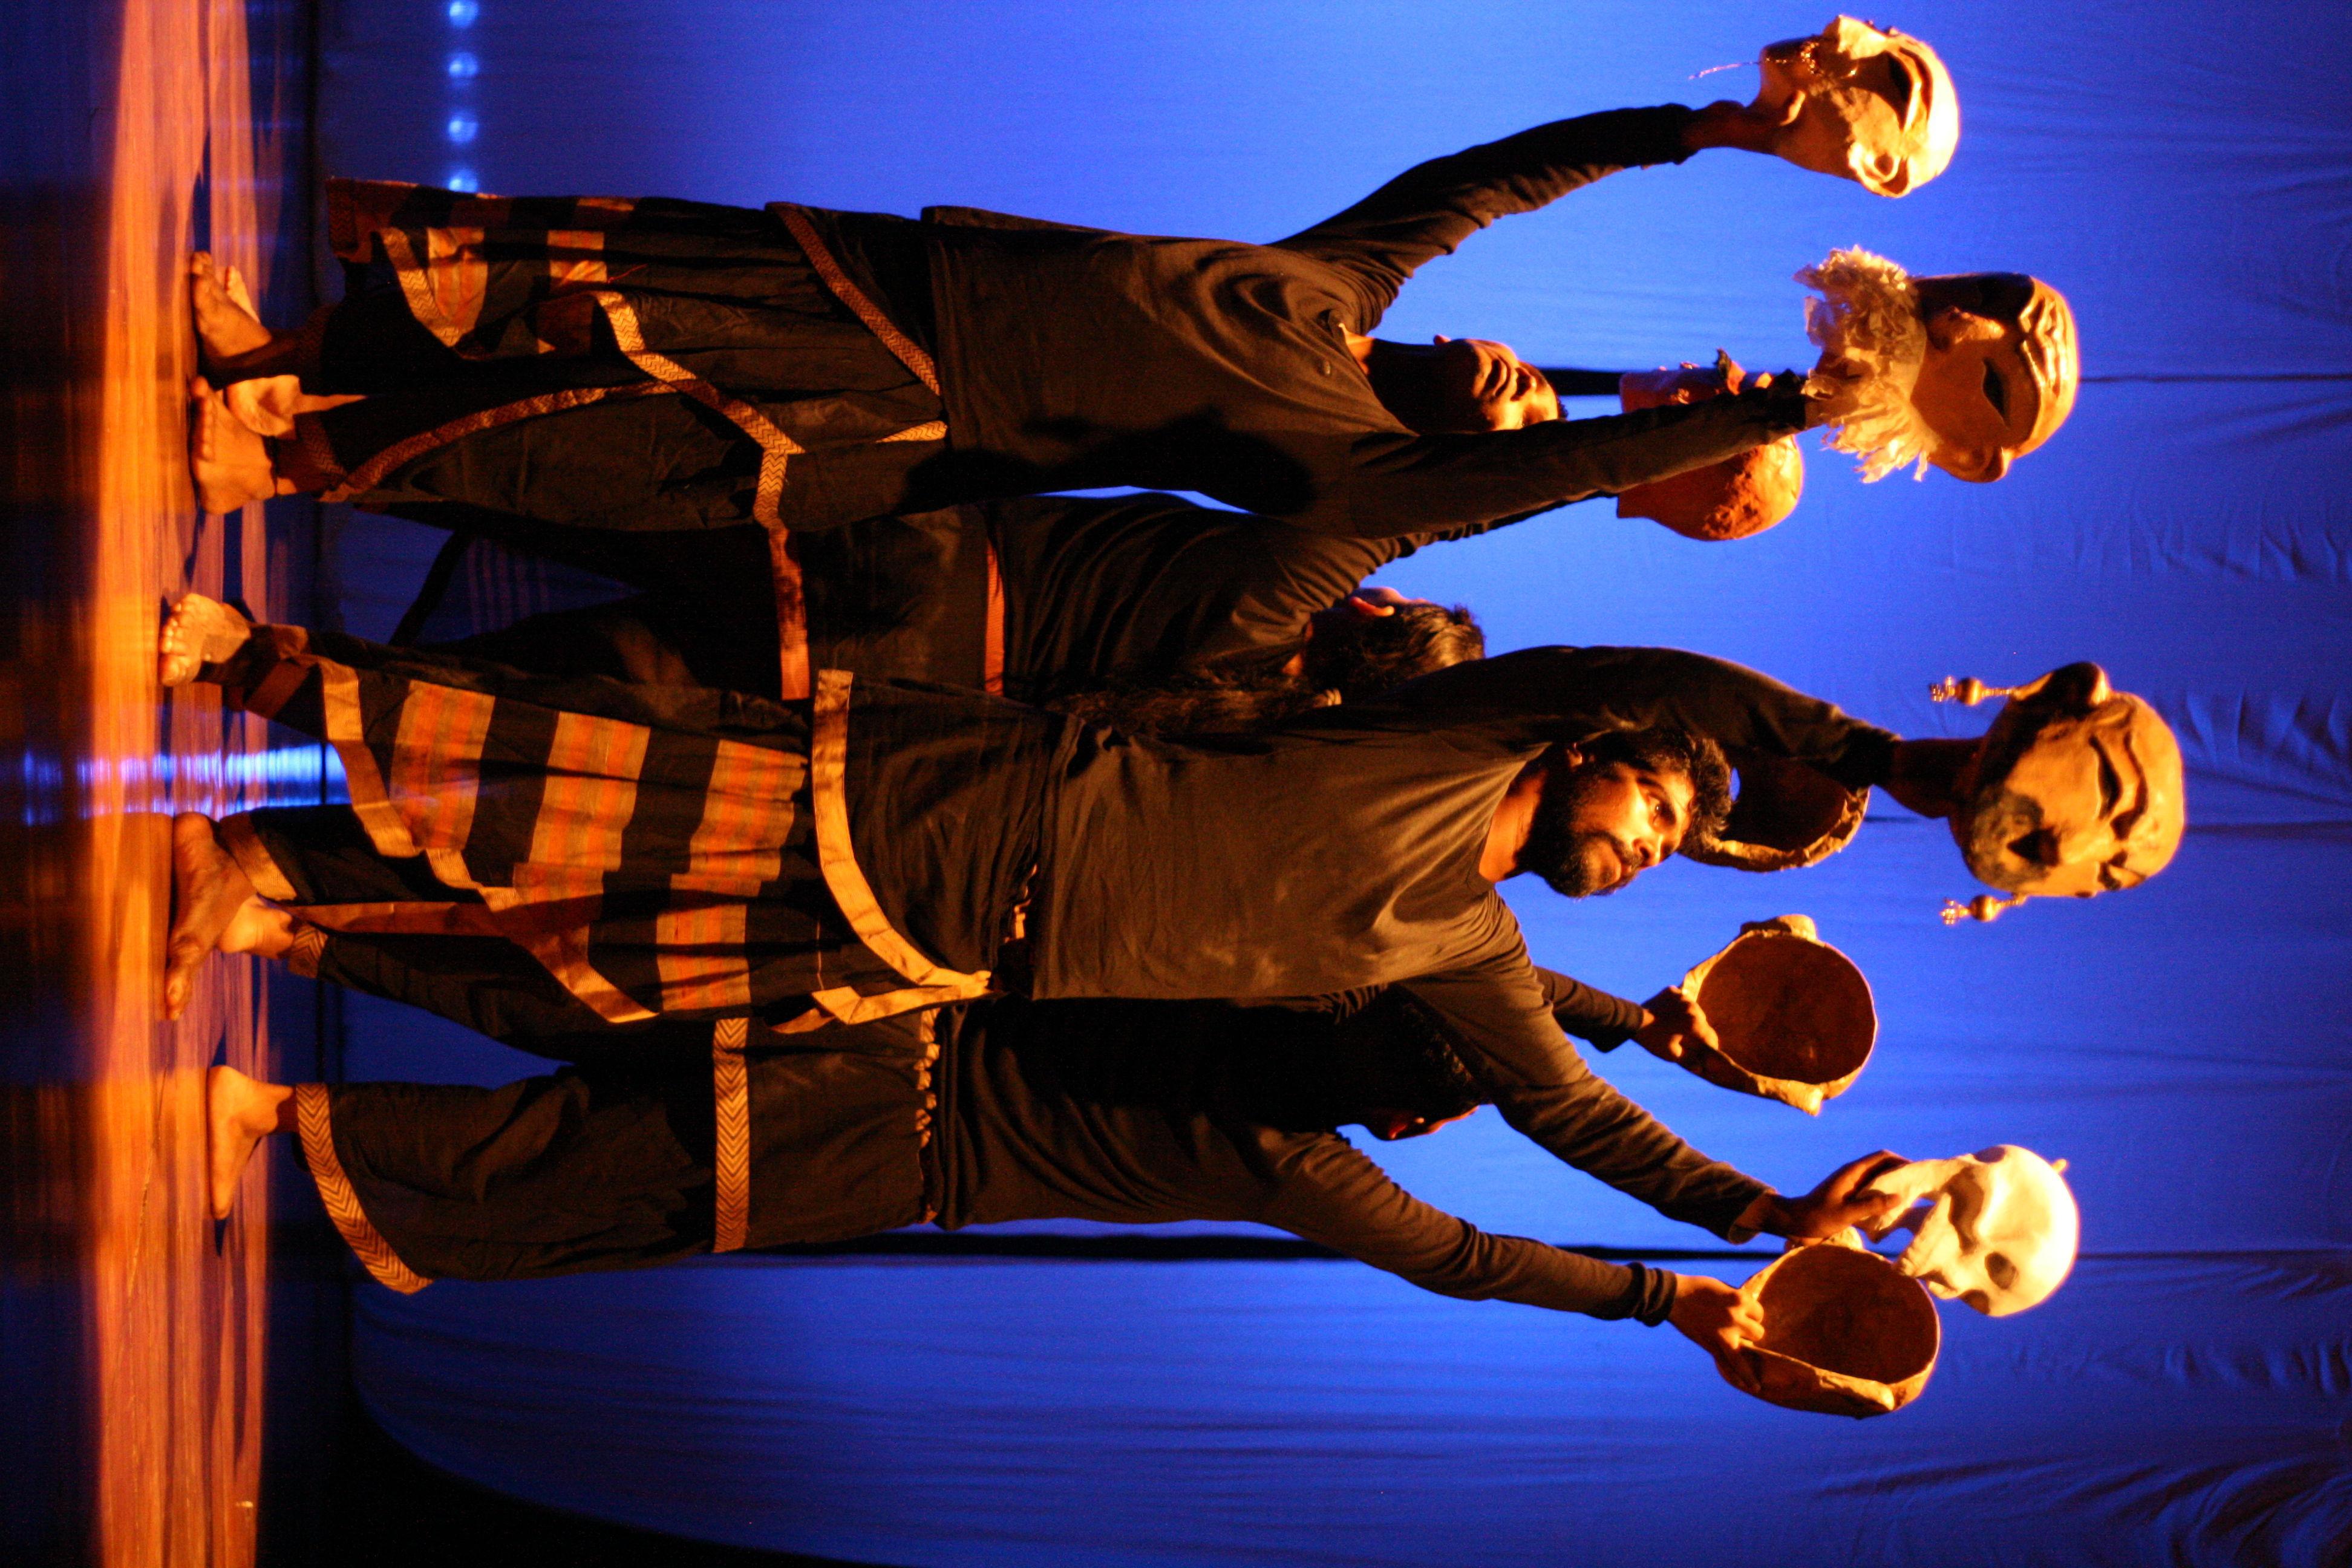 <em>Mahabharata</em> par Katkatha (New Delhi), concept et mise en scène : Anurupa Roy, marionnettistes : Mohammad Shameem, Vivek Kumar, Anurupa Roy, Avinash Kumar, Gunduraju. Acteurs et masques